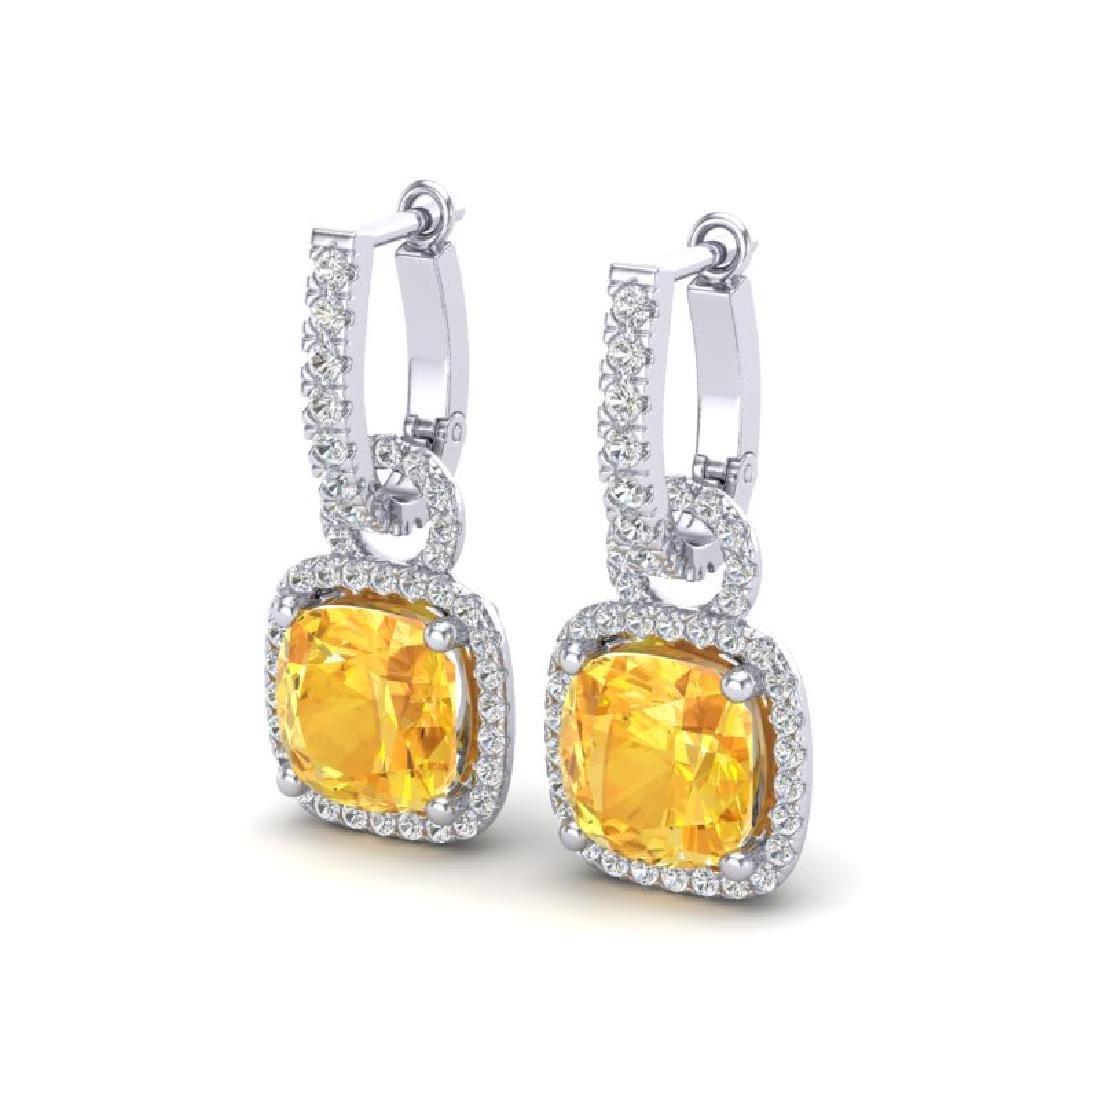 7 CTW Citrine & Micro Pave VS/SI Diamond Earrings 18K